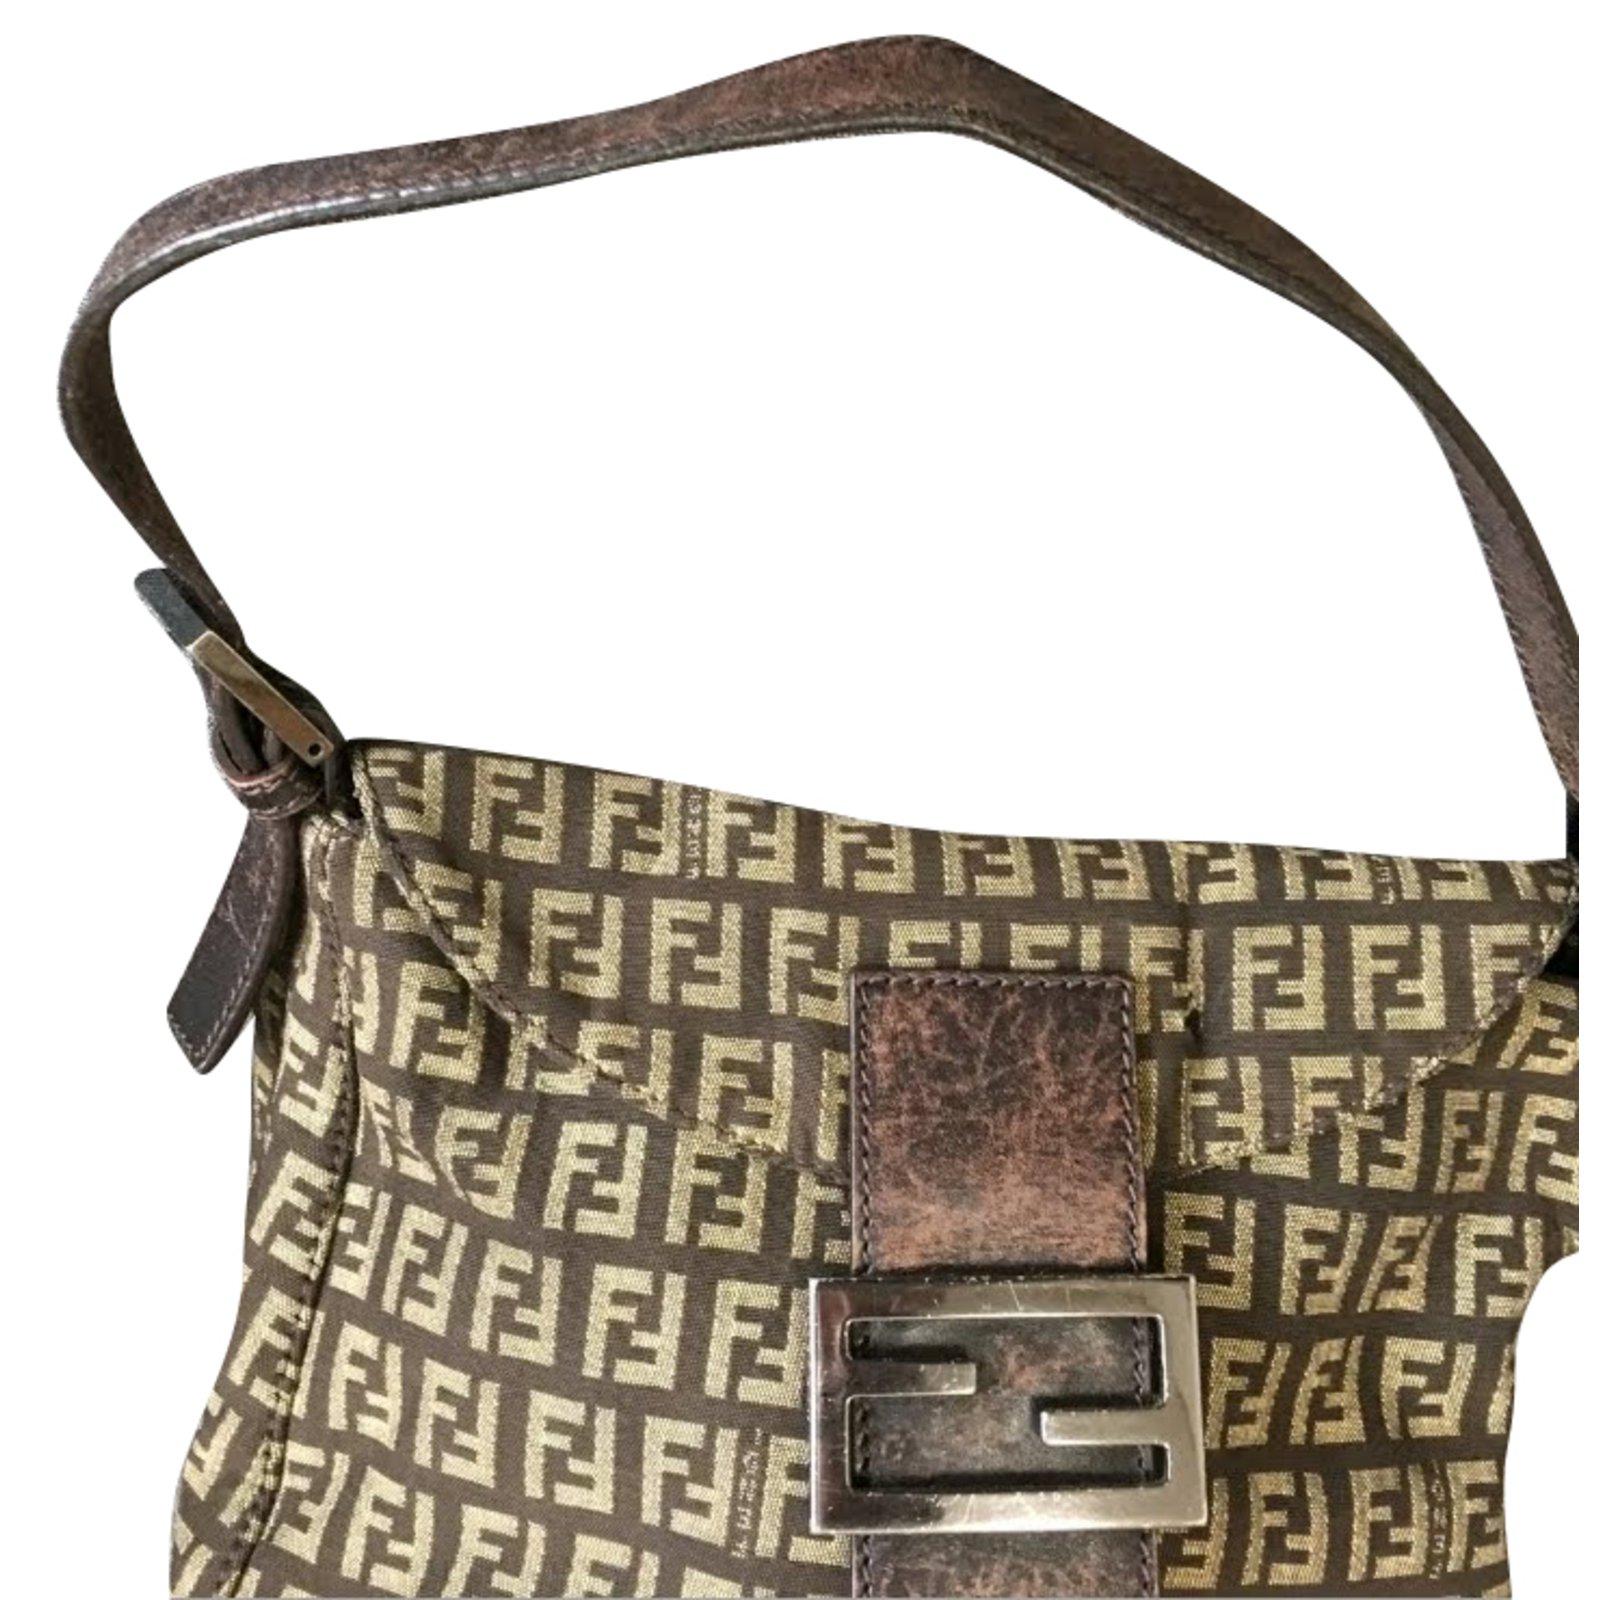 3790bfc699ee ... promo code fendi mama zucca bag handbags leathercotton brown ref.82530  47e10 2b290